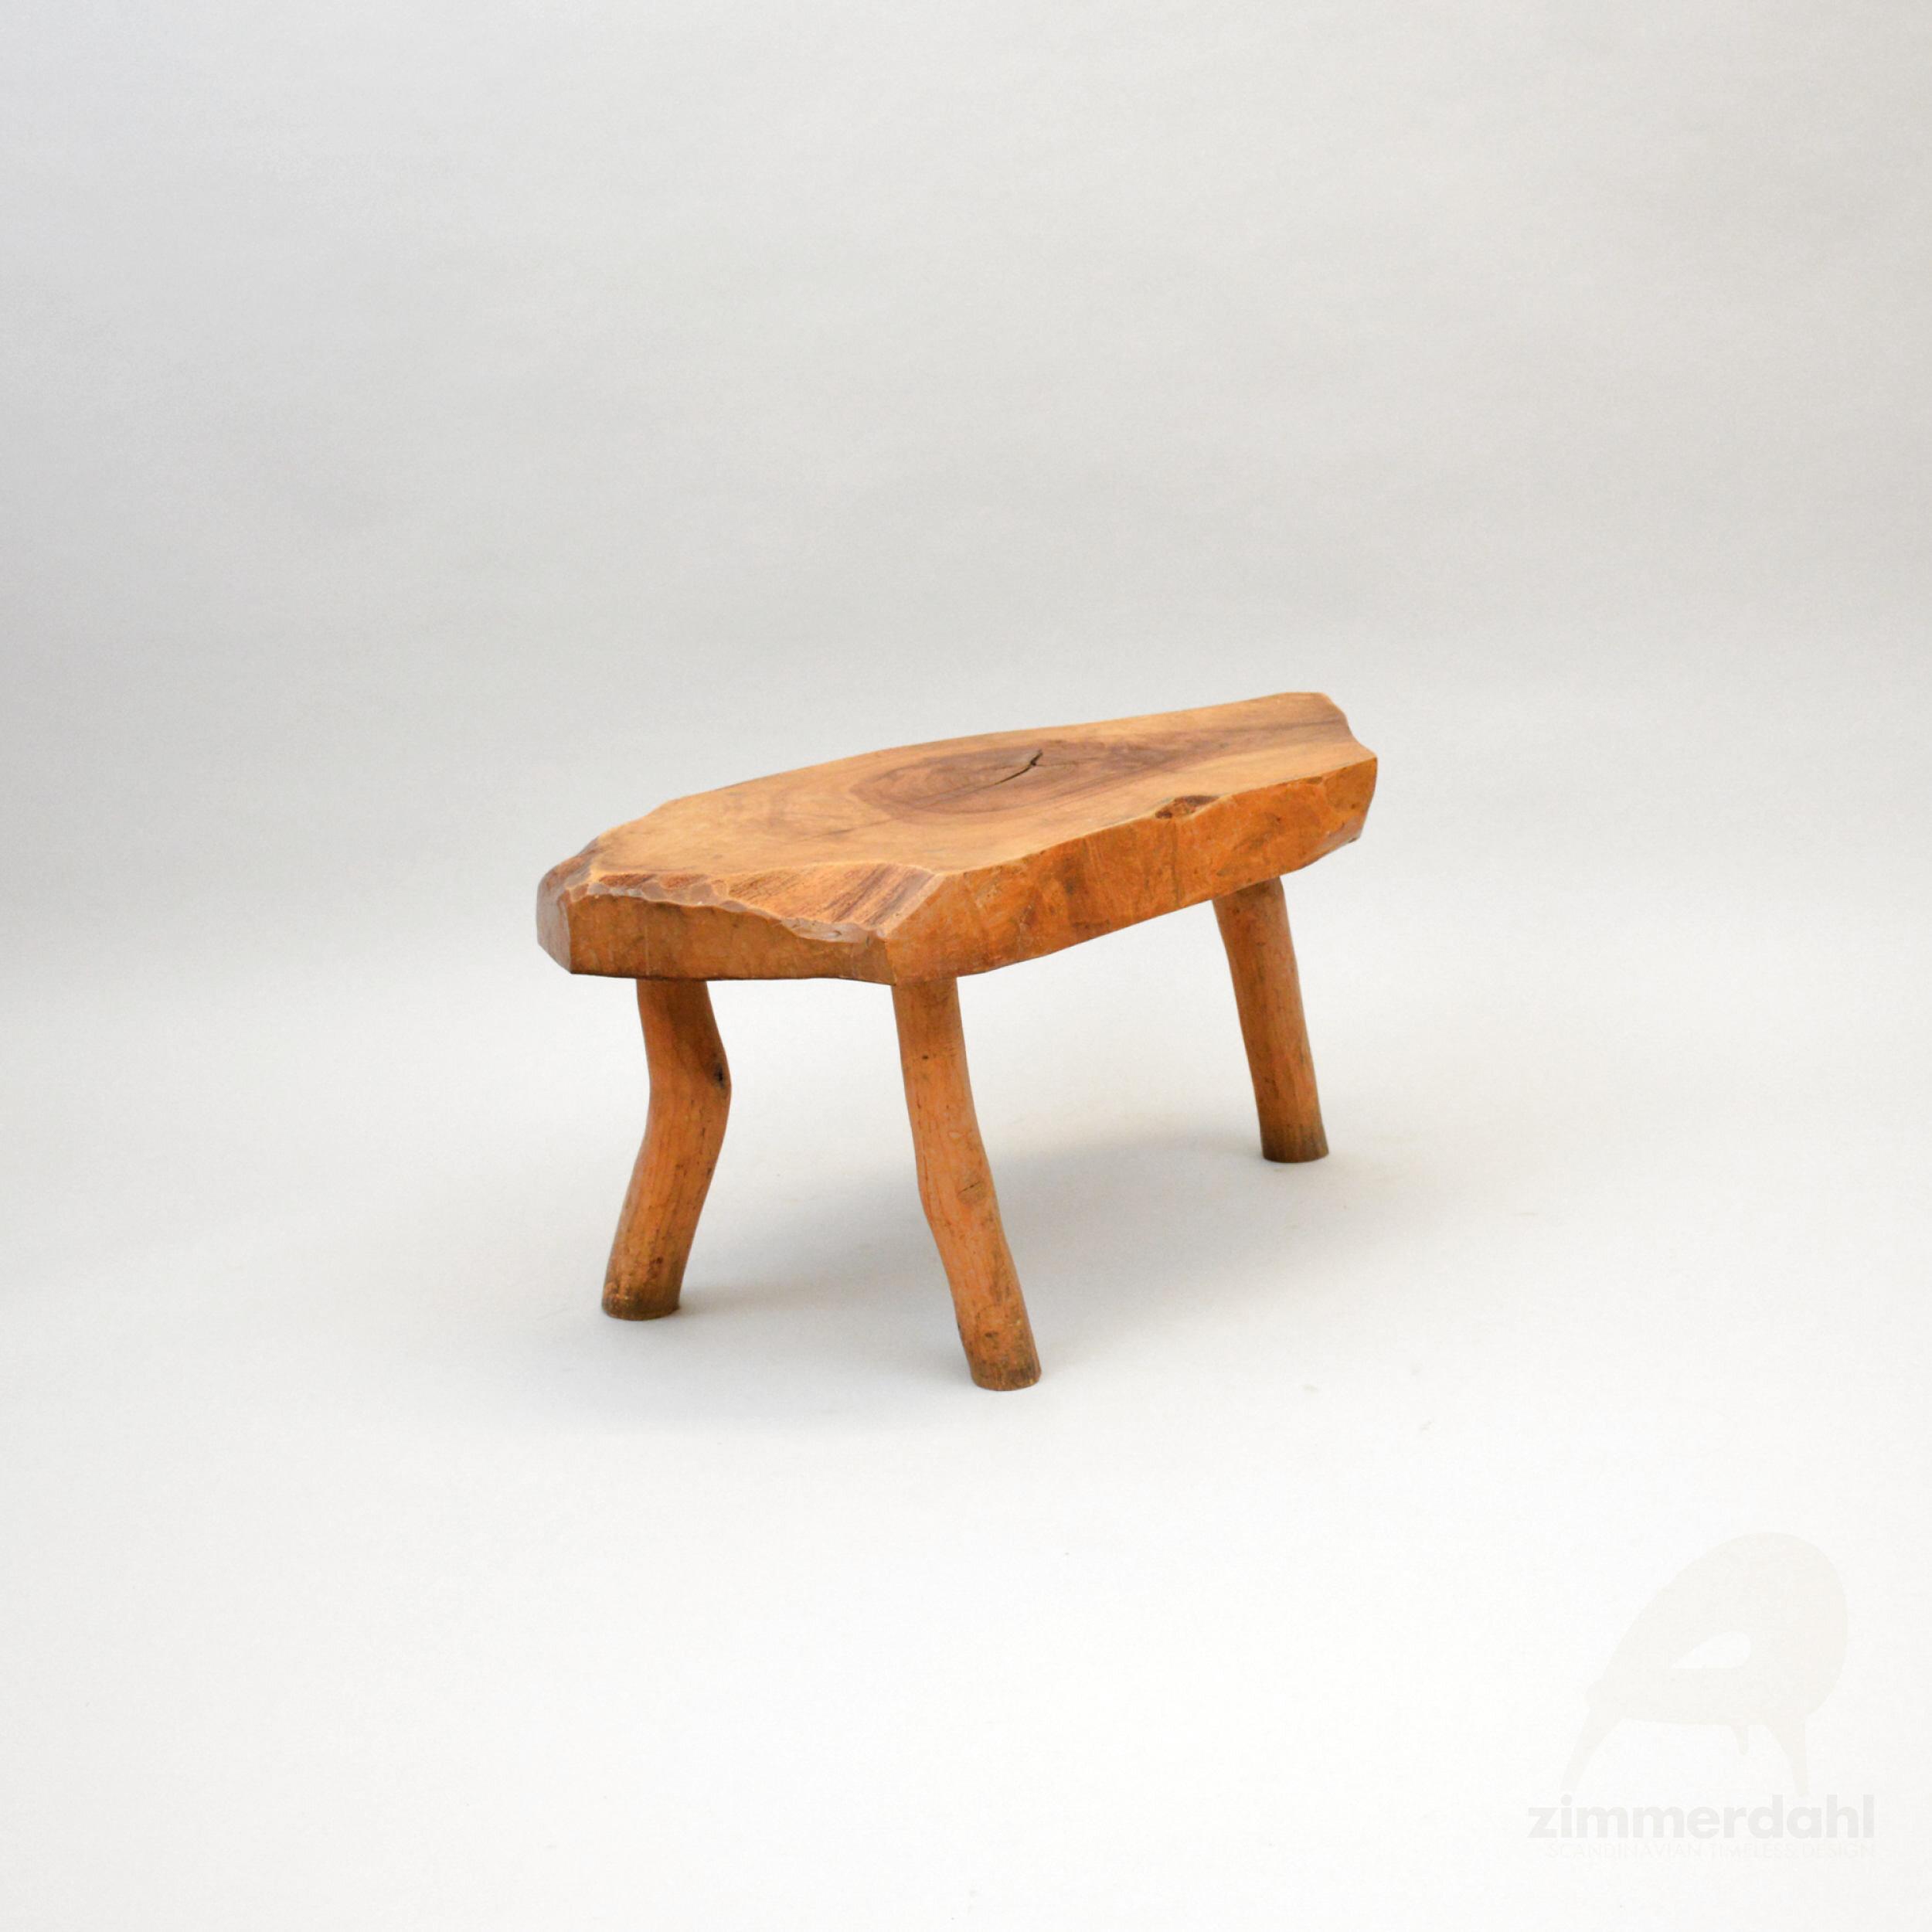 rustic massive wooden table three legged france scandinavian timeless design zimmerdahl antiques design ab